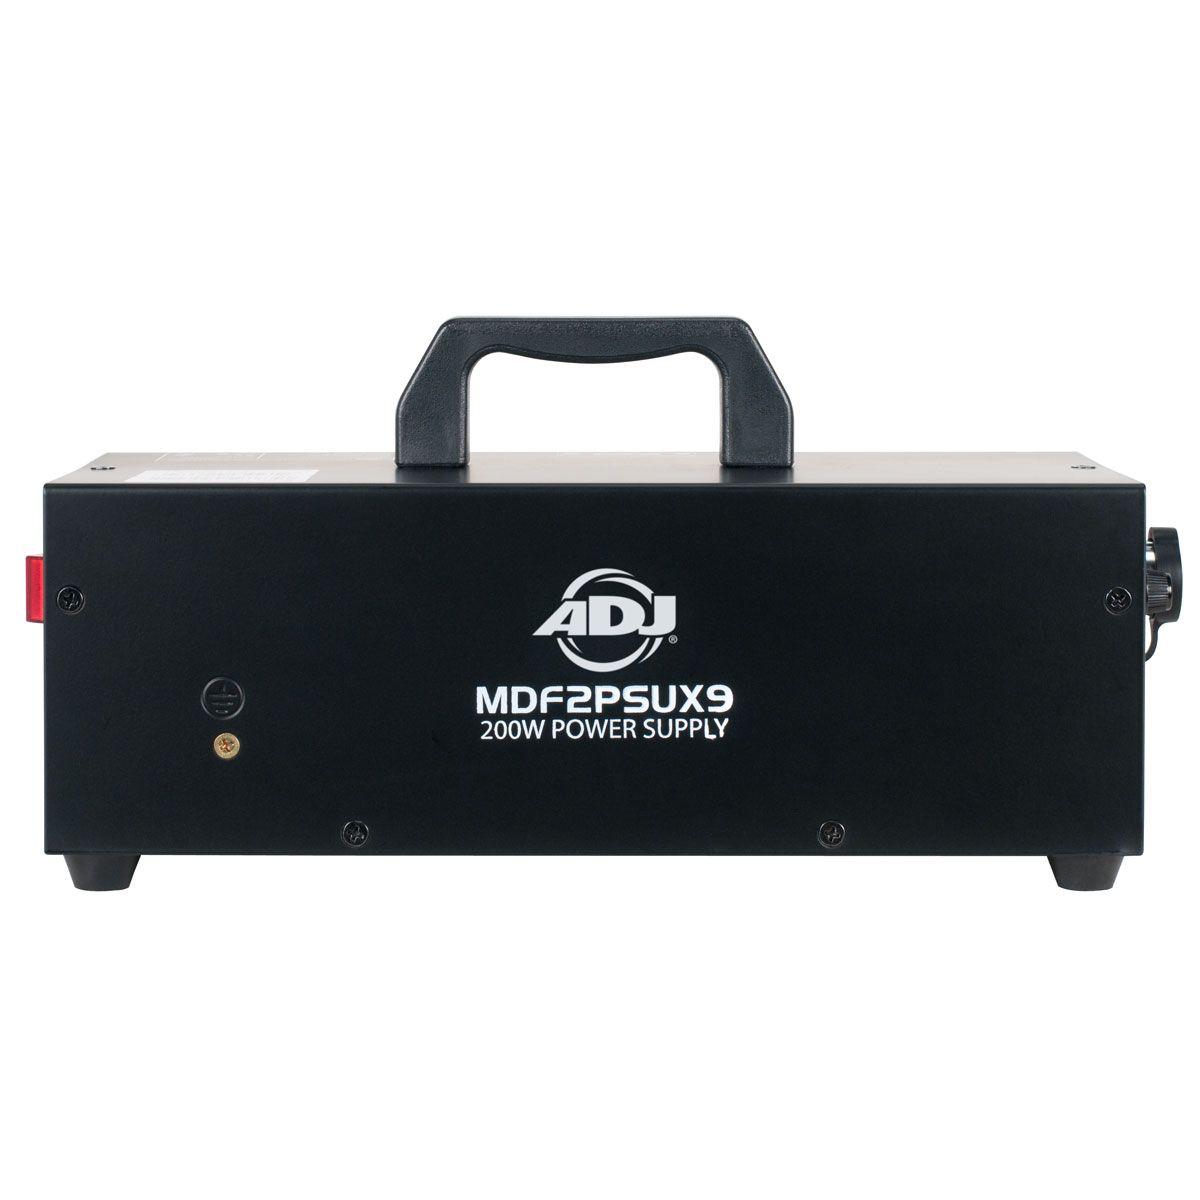 american-dj-mdf2psux9-mdf232--power-supply-for-9x-mdf2.jpg